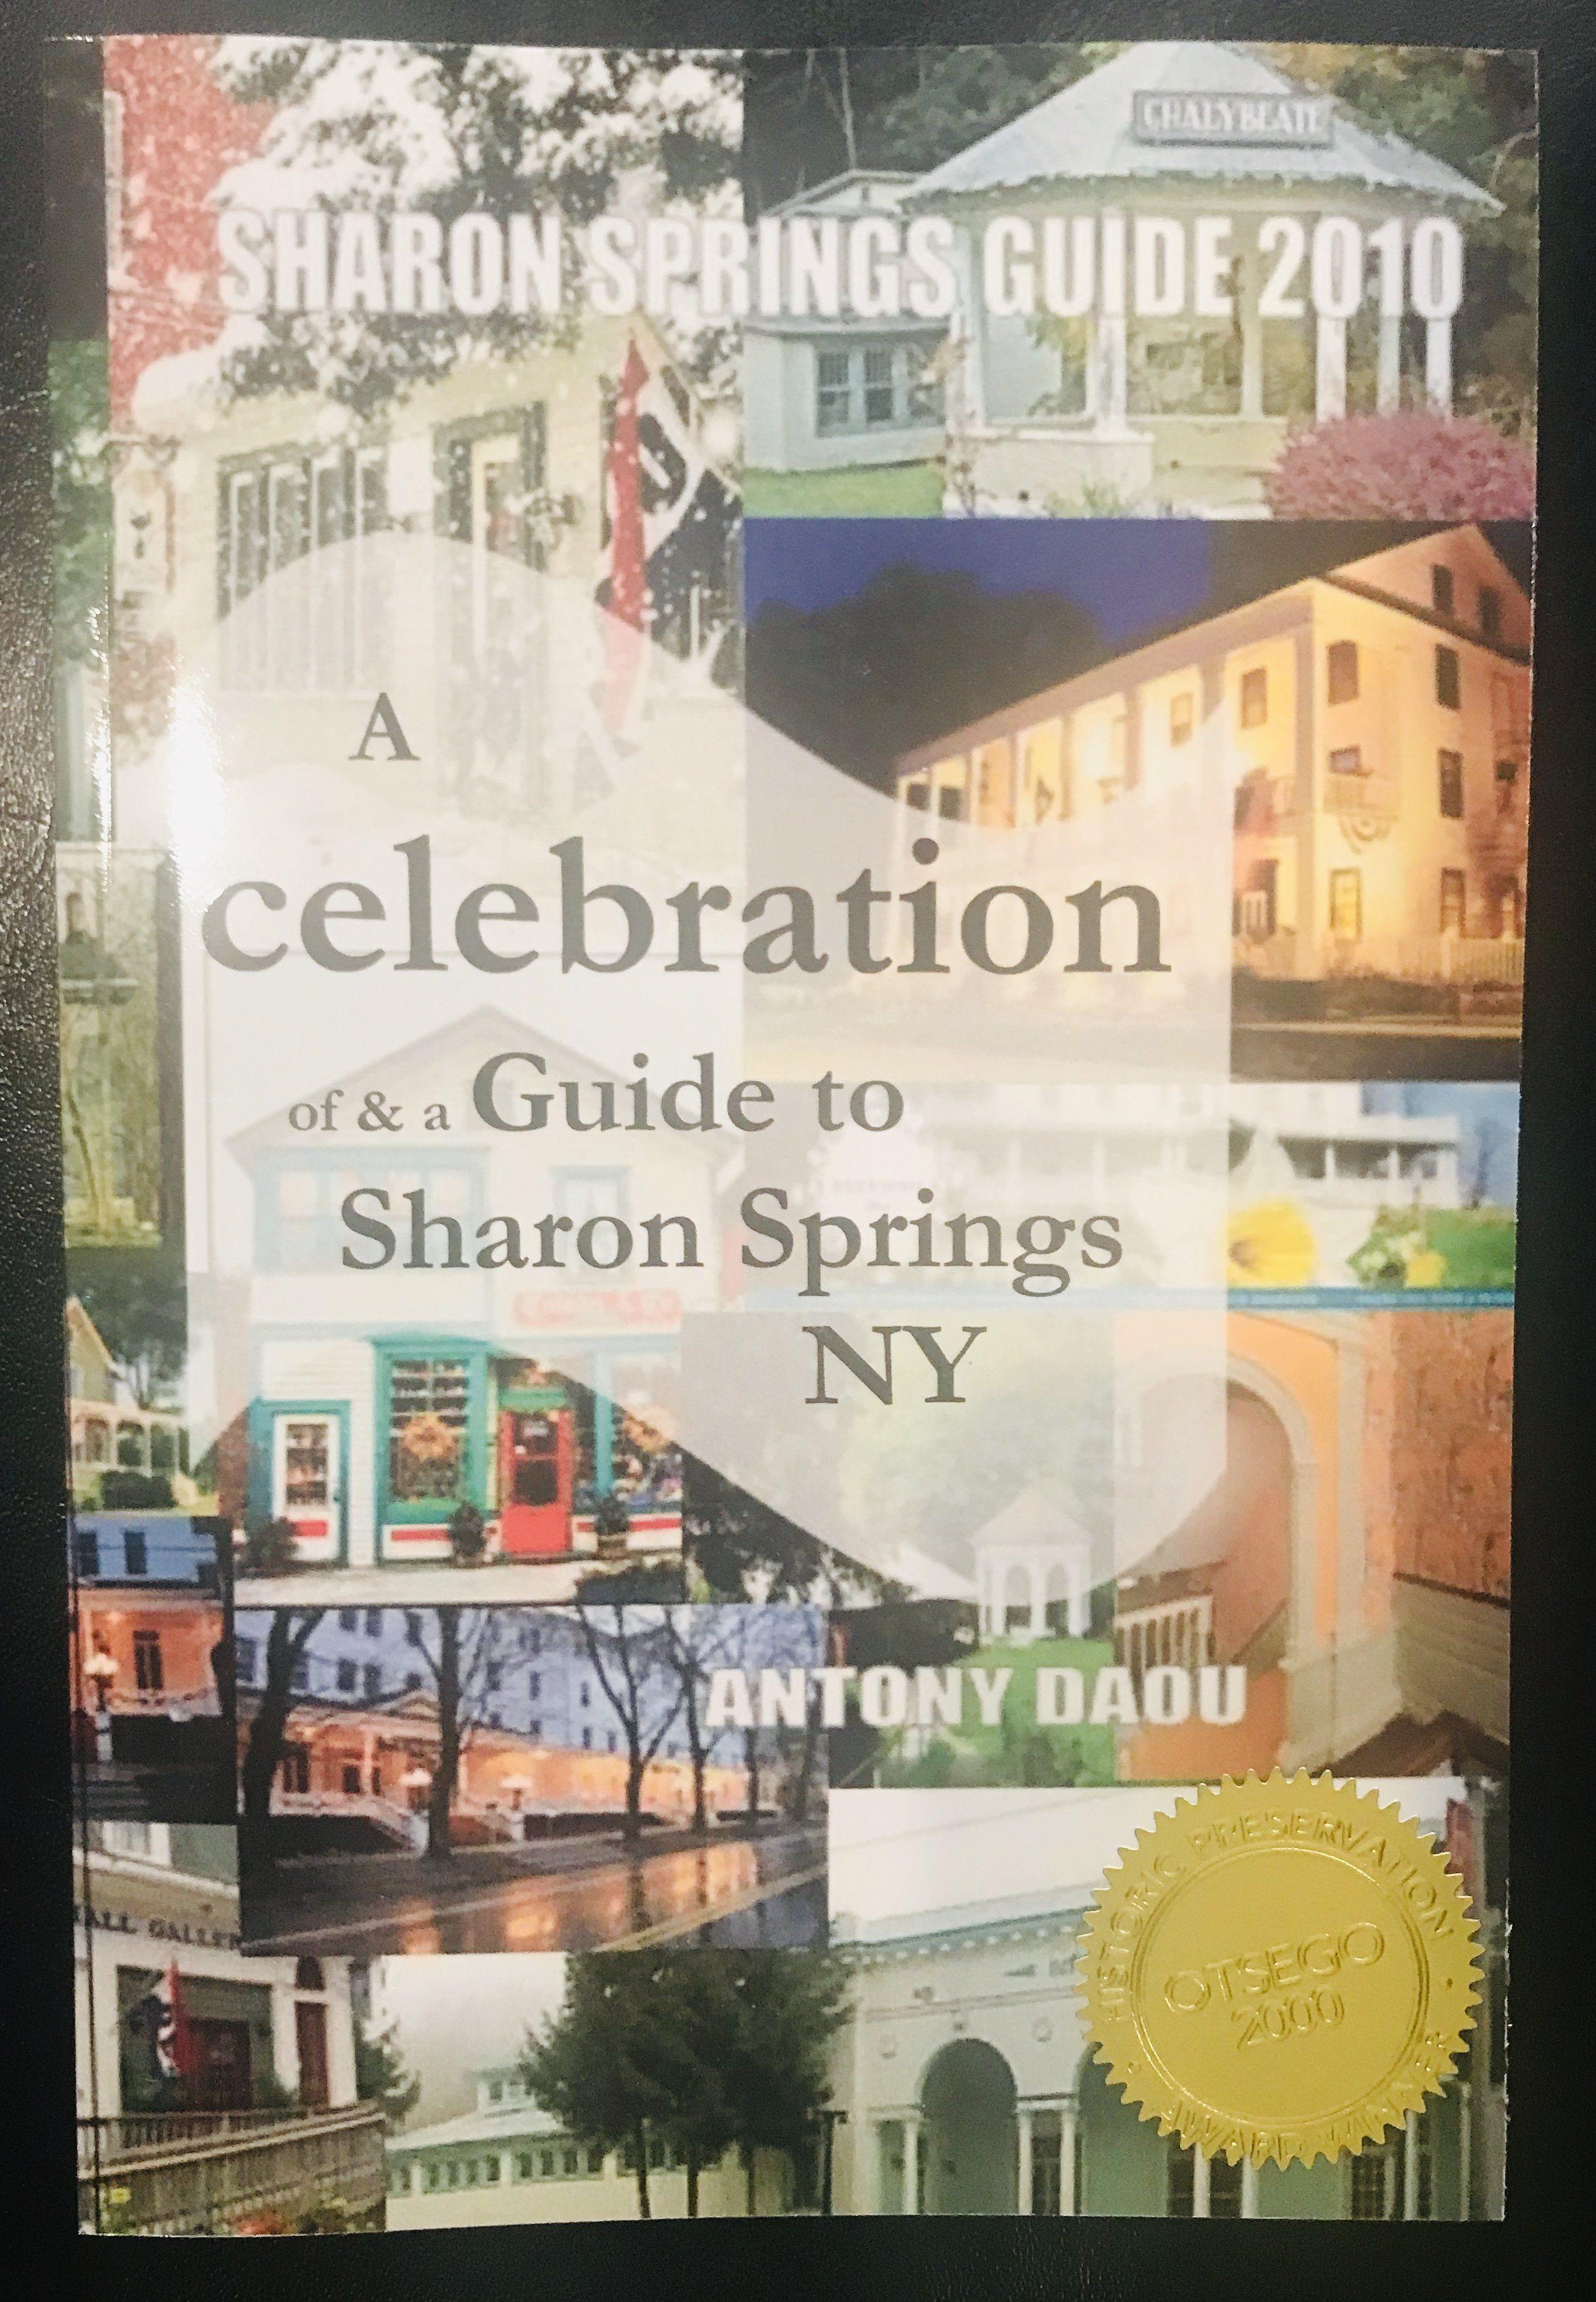 Sharon Springs Guide Otsego 2000 Historic Preservation